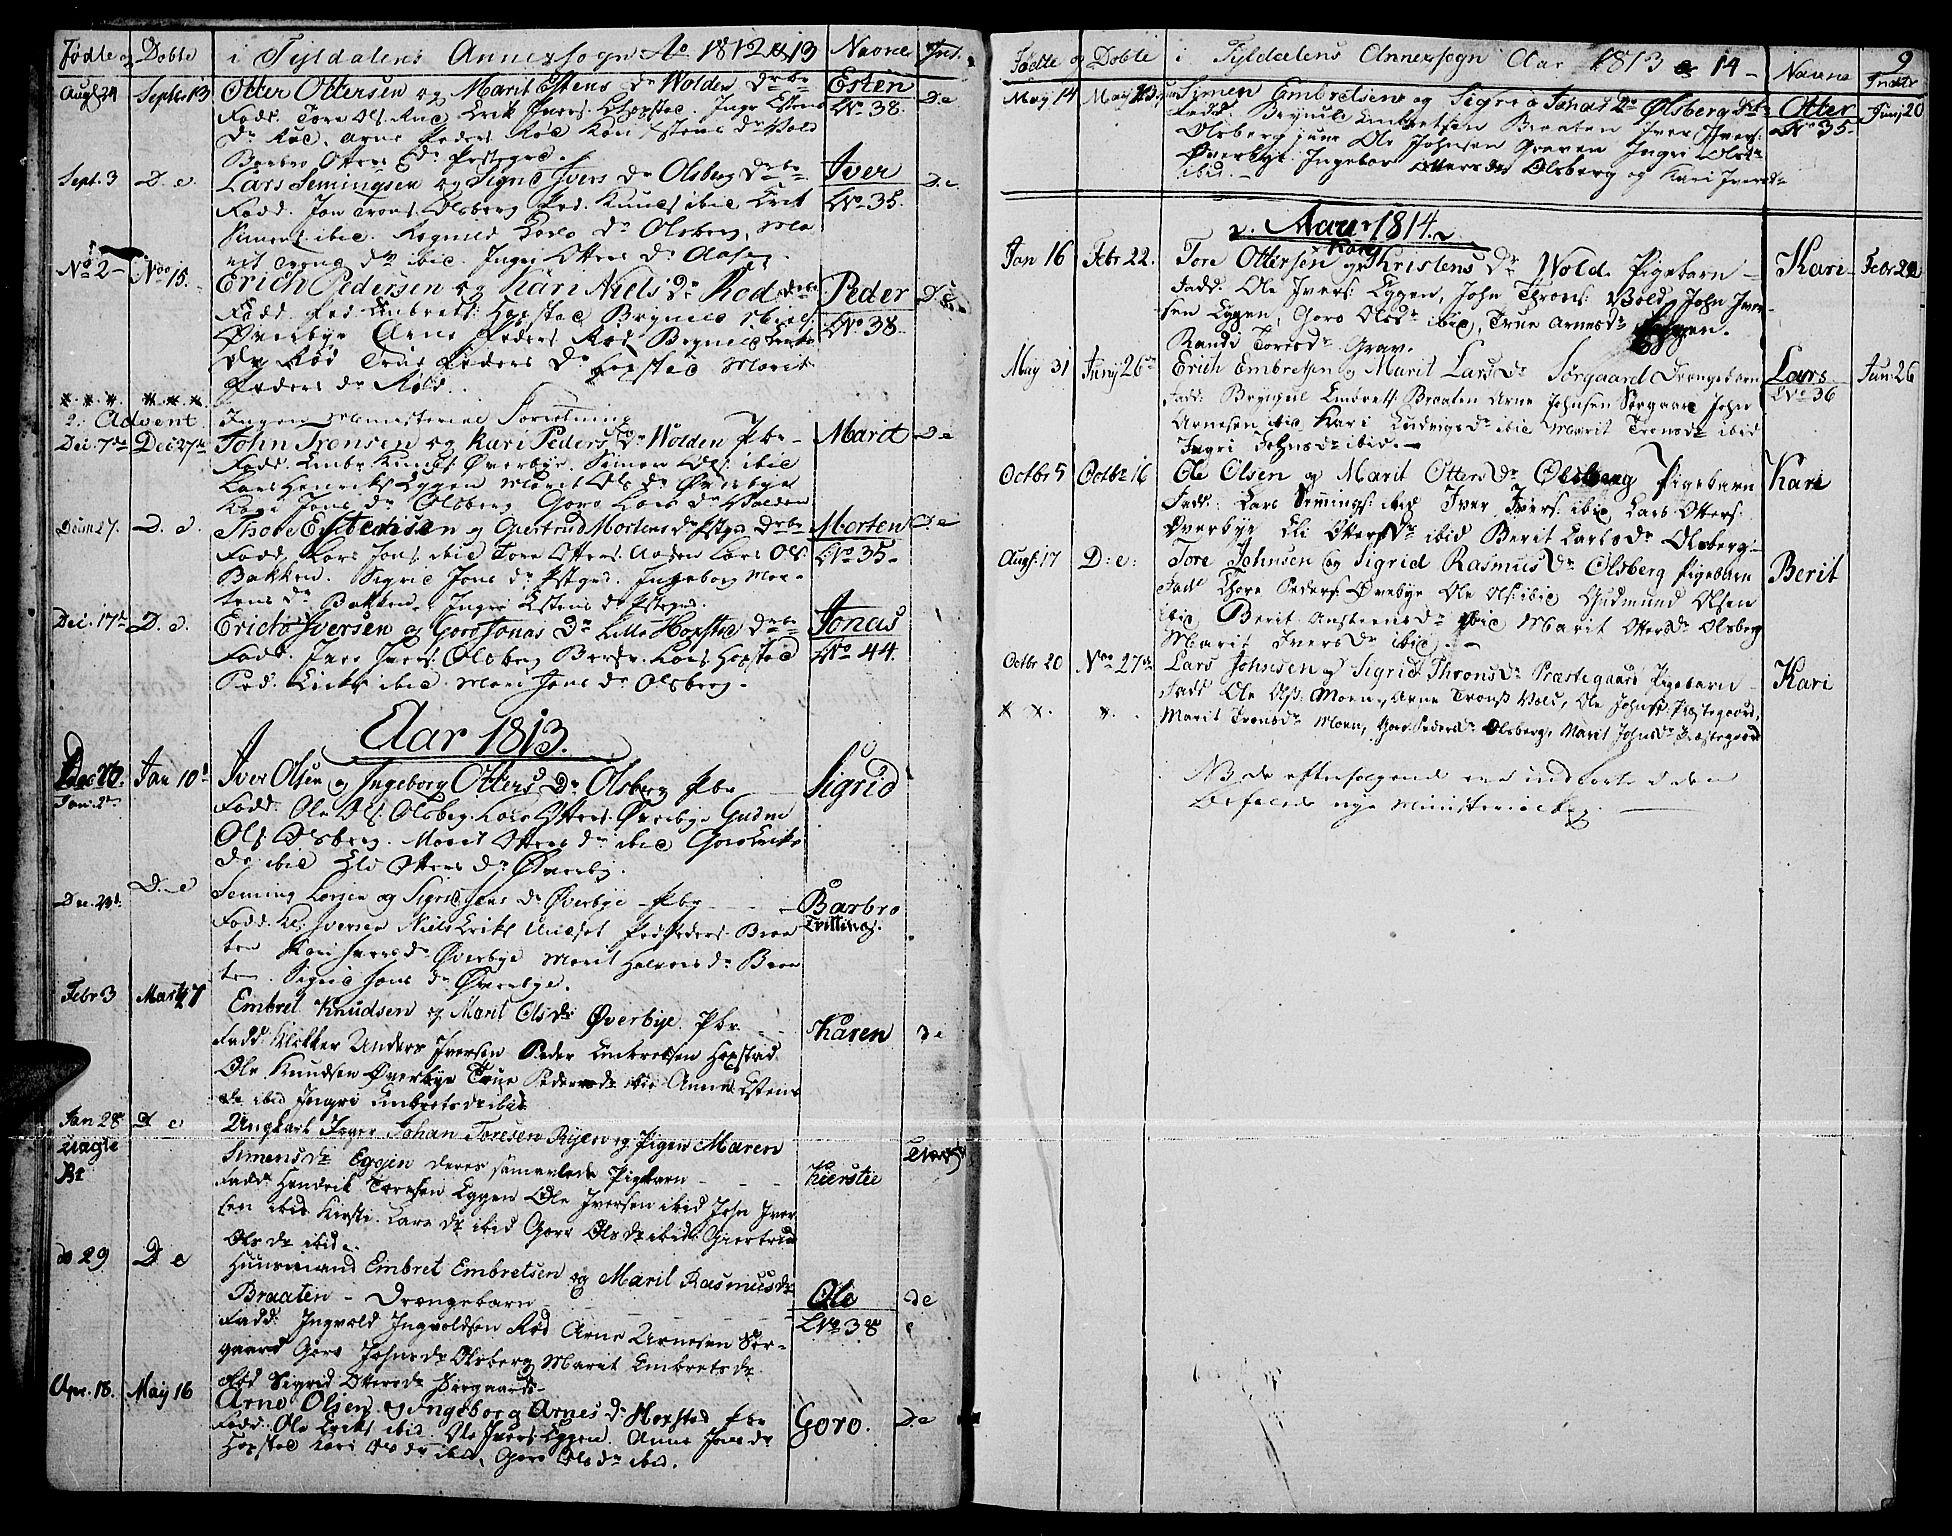 SAH, Tynset prestekontor, Ministerialbok nr. 17, 1801-1814, s. 9